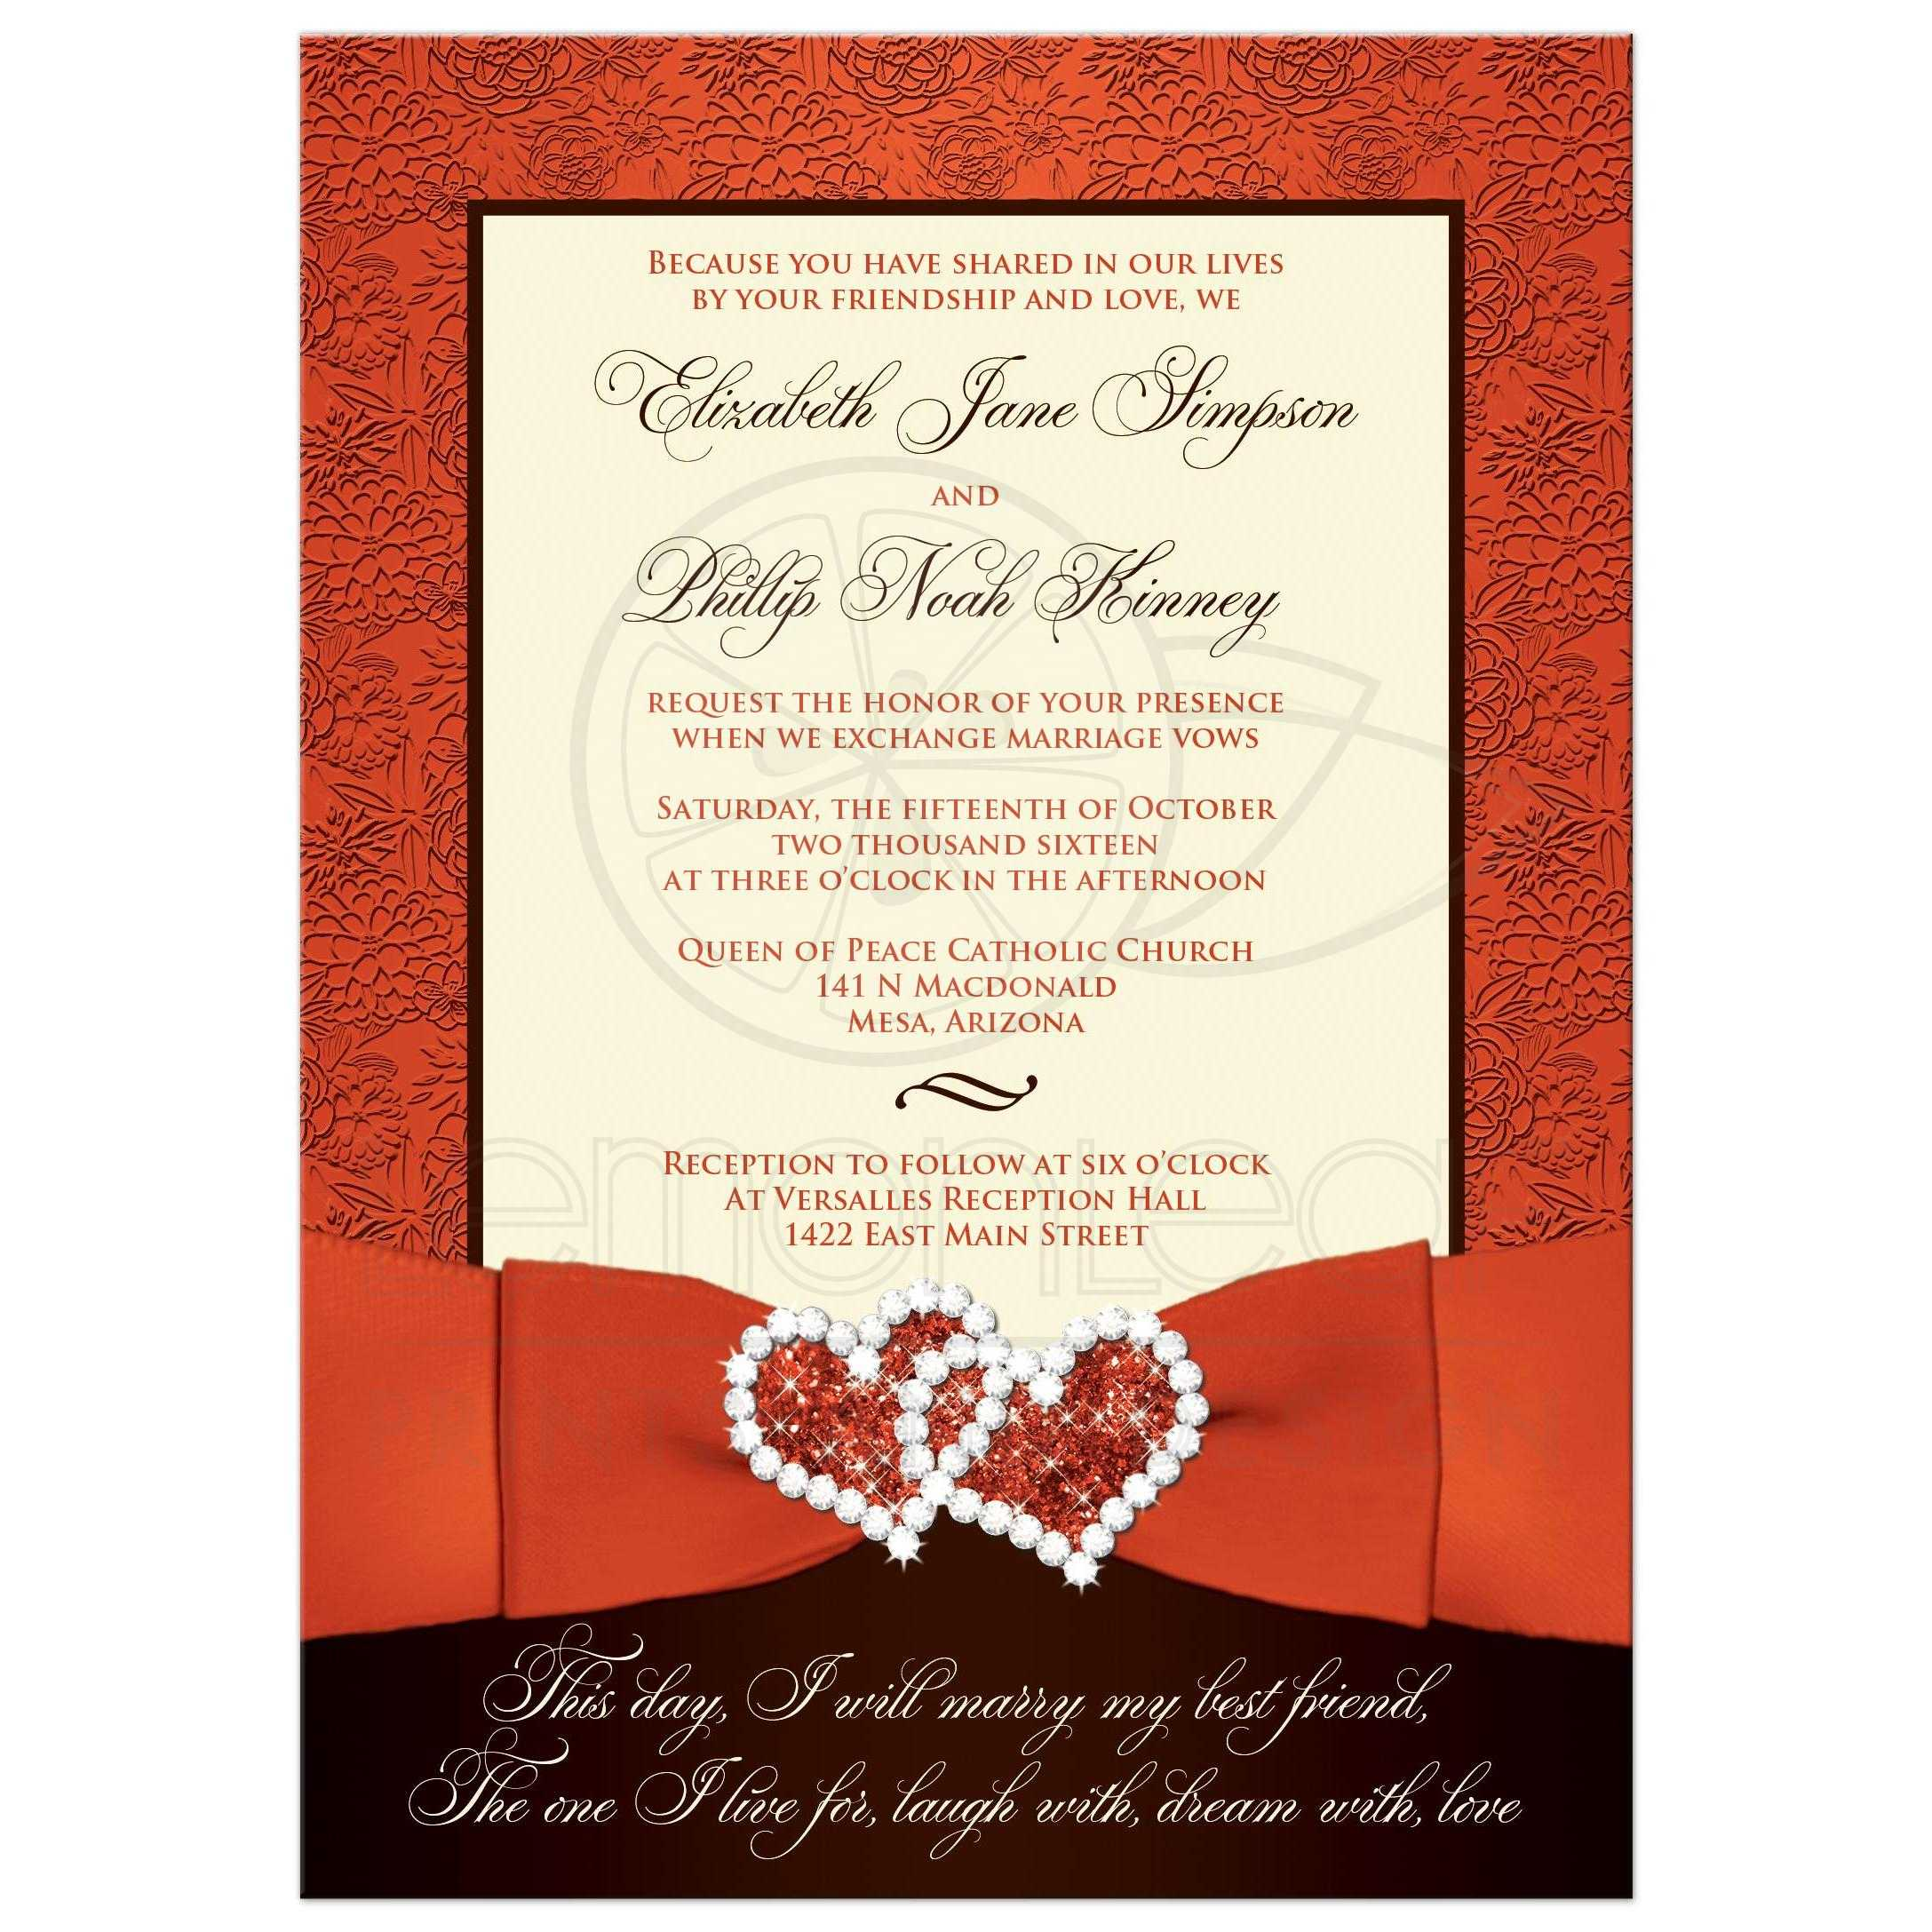 Romantic Wedding Invitation In Orange Ivory And Brown With Ribbon: Orange And Brown Wedding Invitations At Reisefeber.org